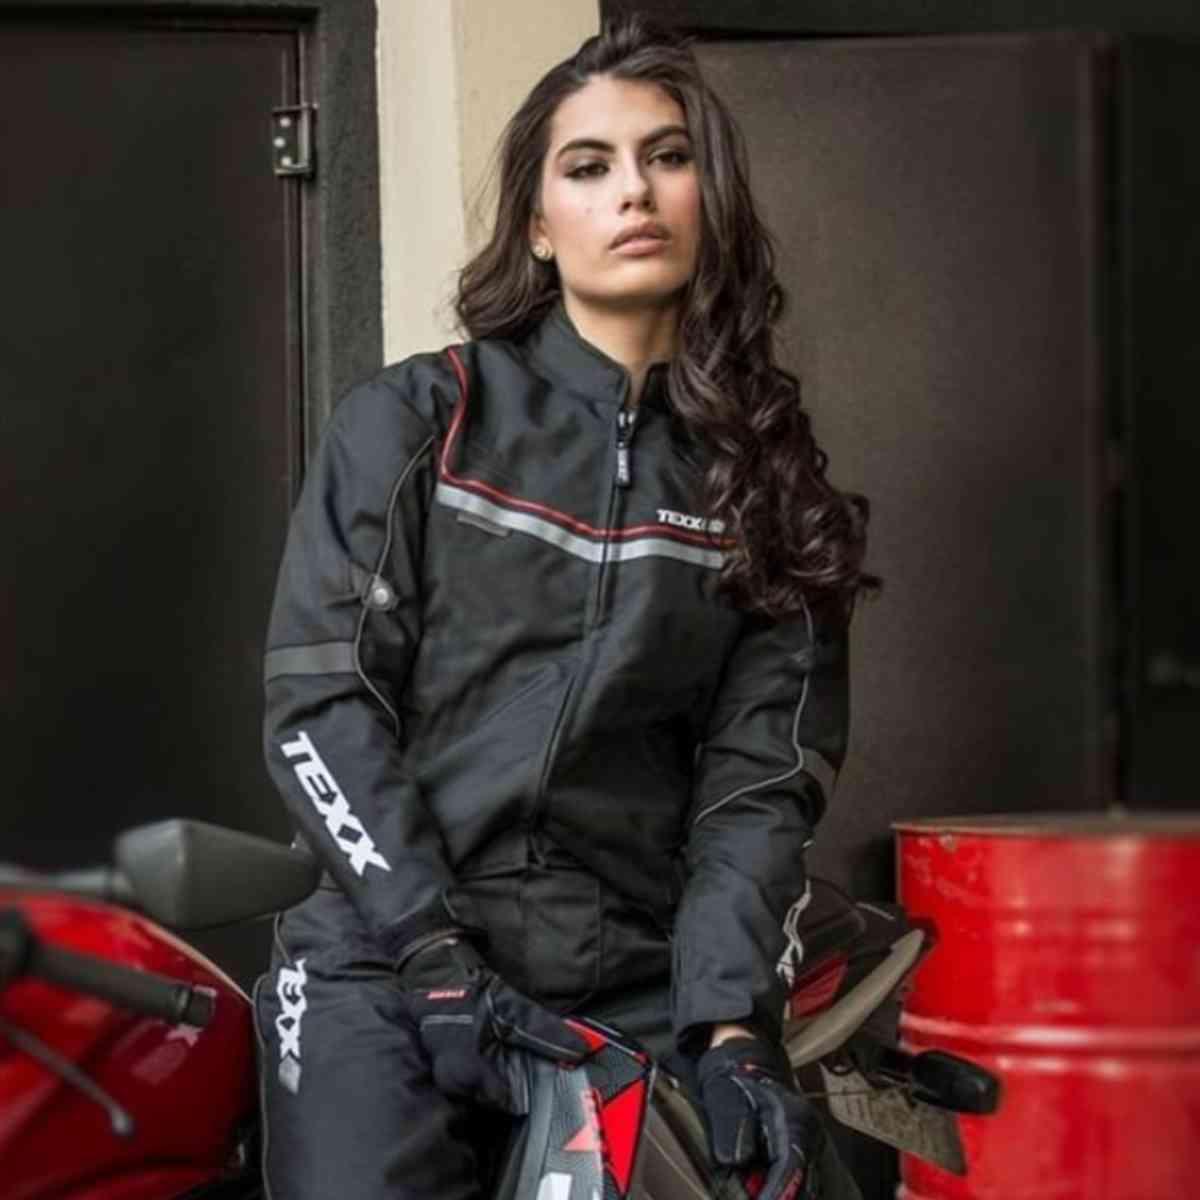 JAQUETA DE MOTOCICLISTA FEMININA TEXX STRIKE LADY V2 2XL + CAPACETE DE MOTO AXXIS DREAMS FOSCO Nº 56